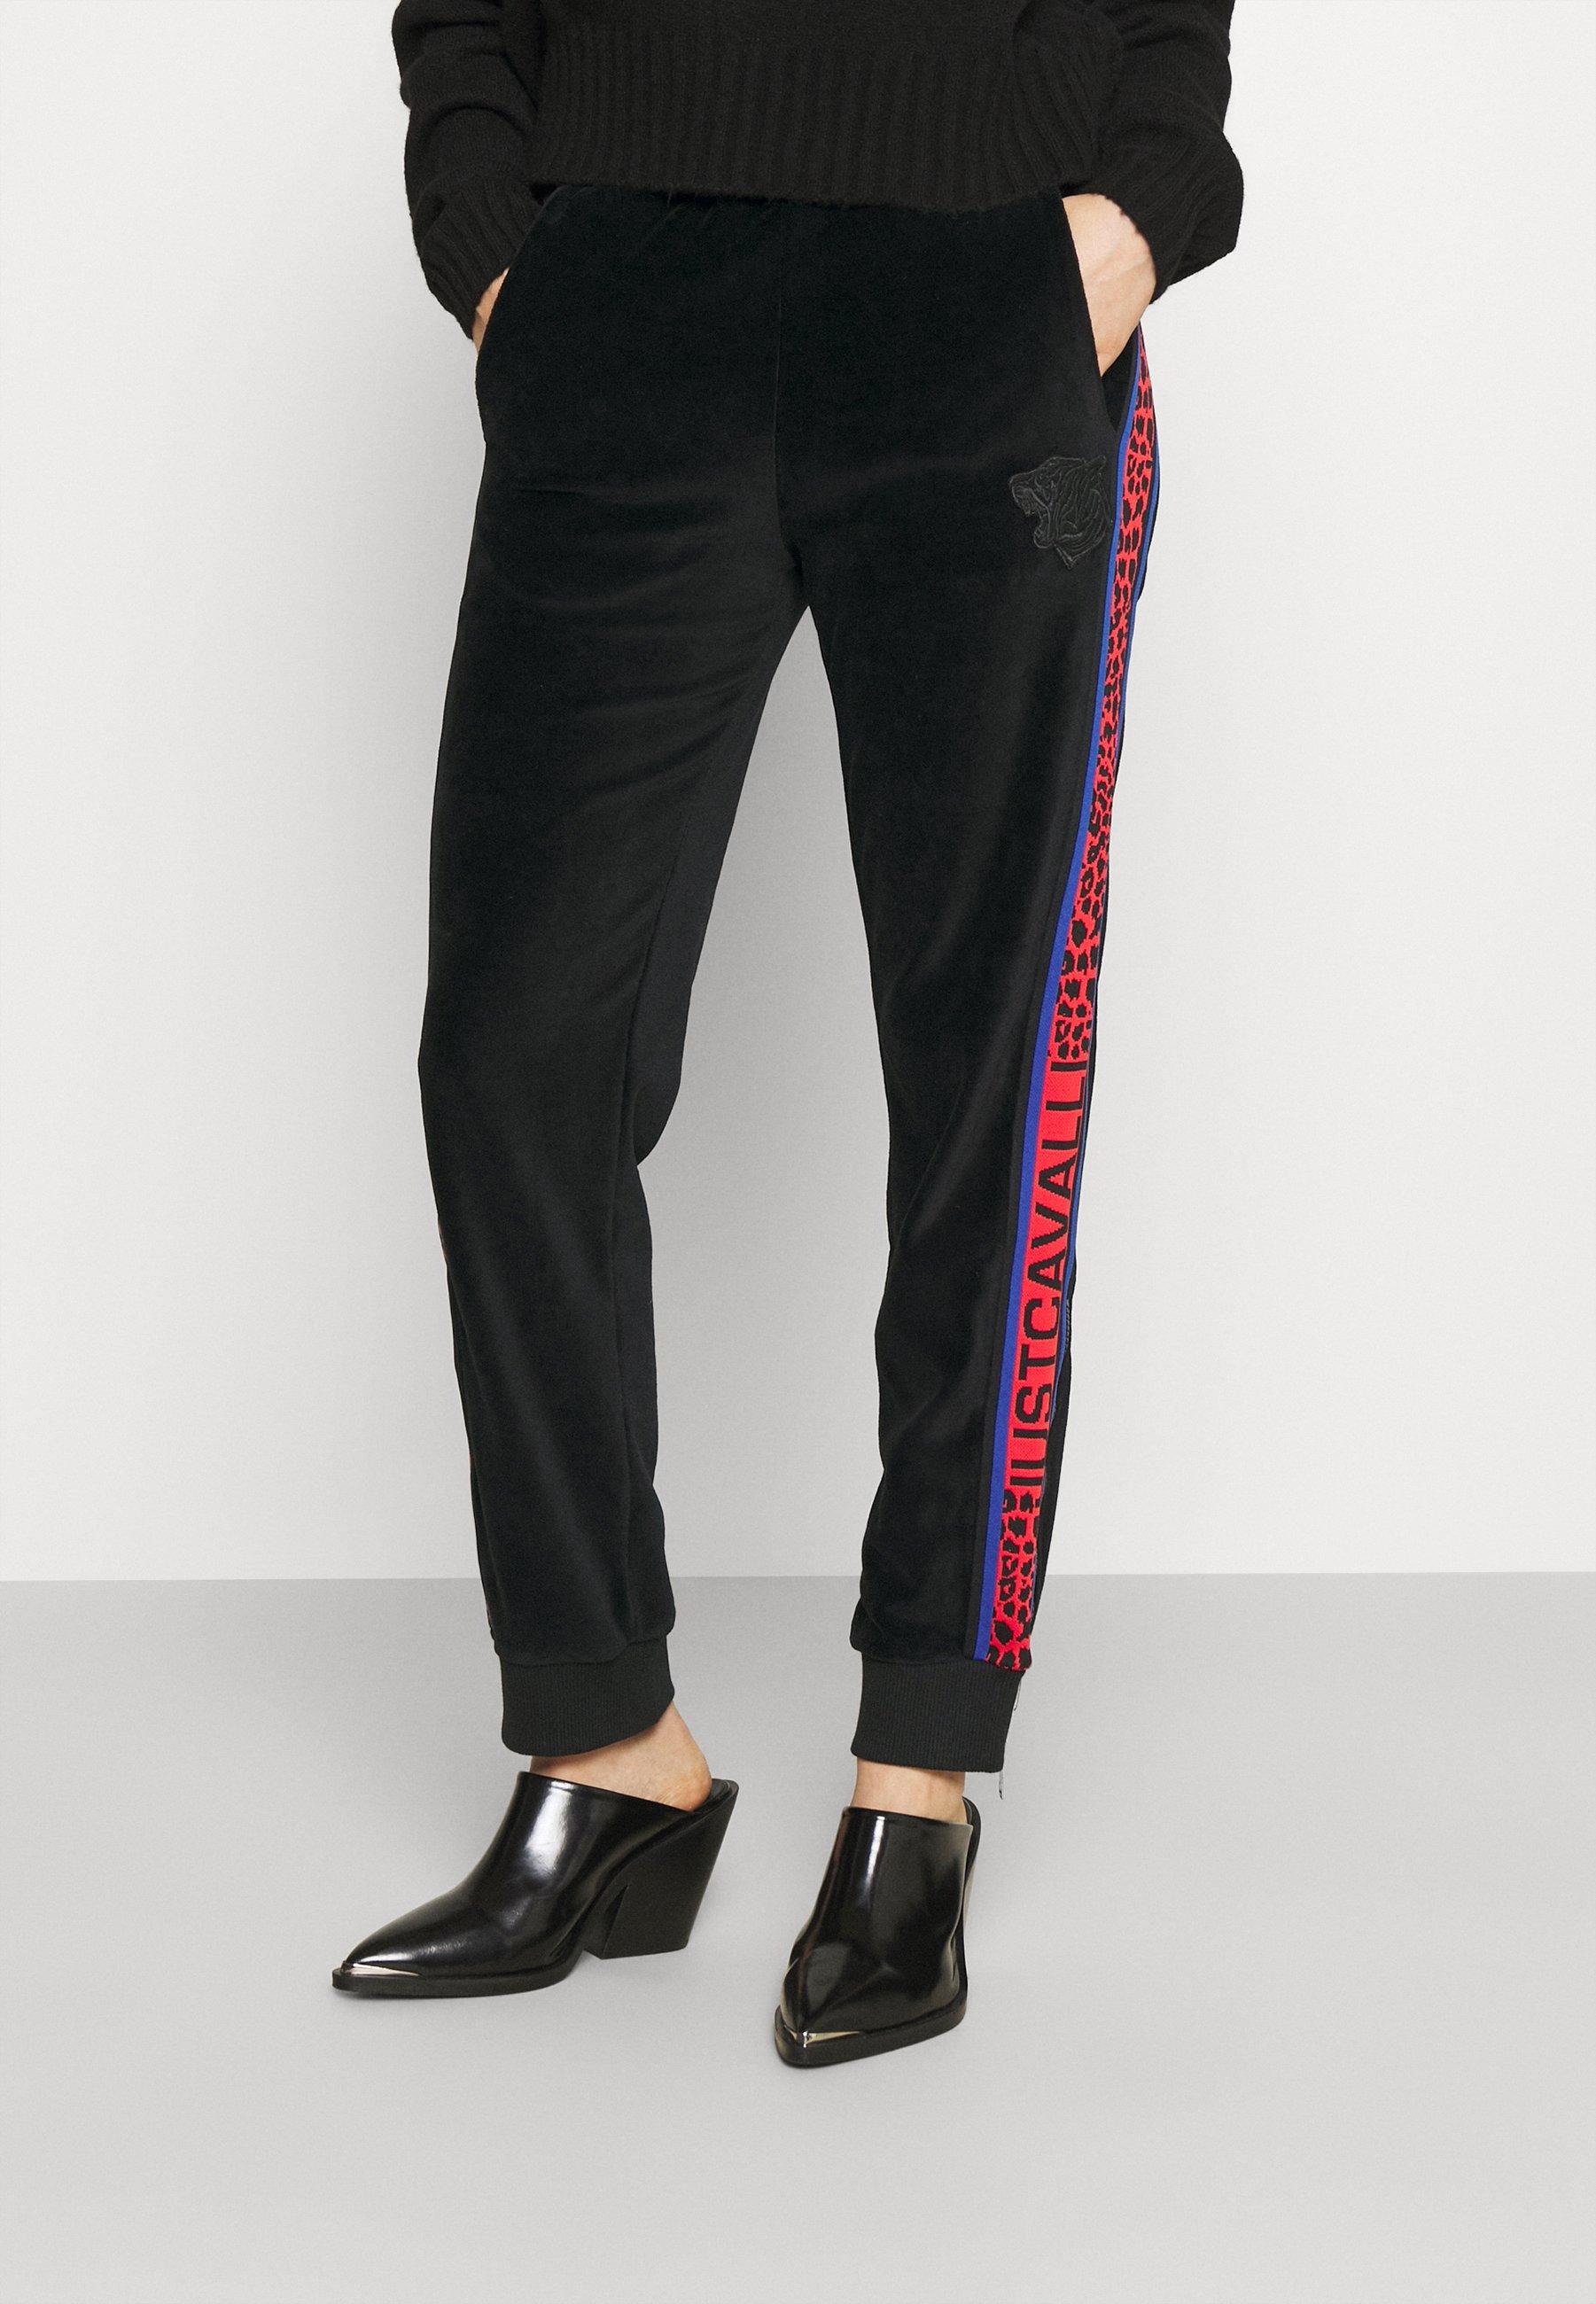 Damen PANTS - Jogginghose